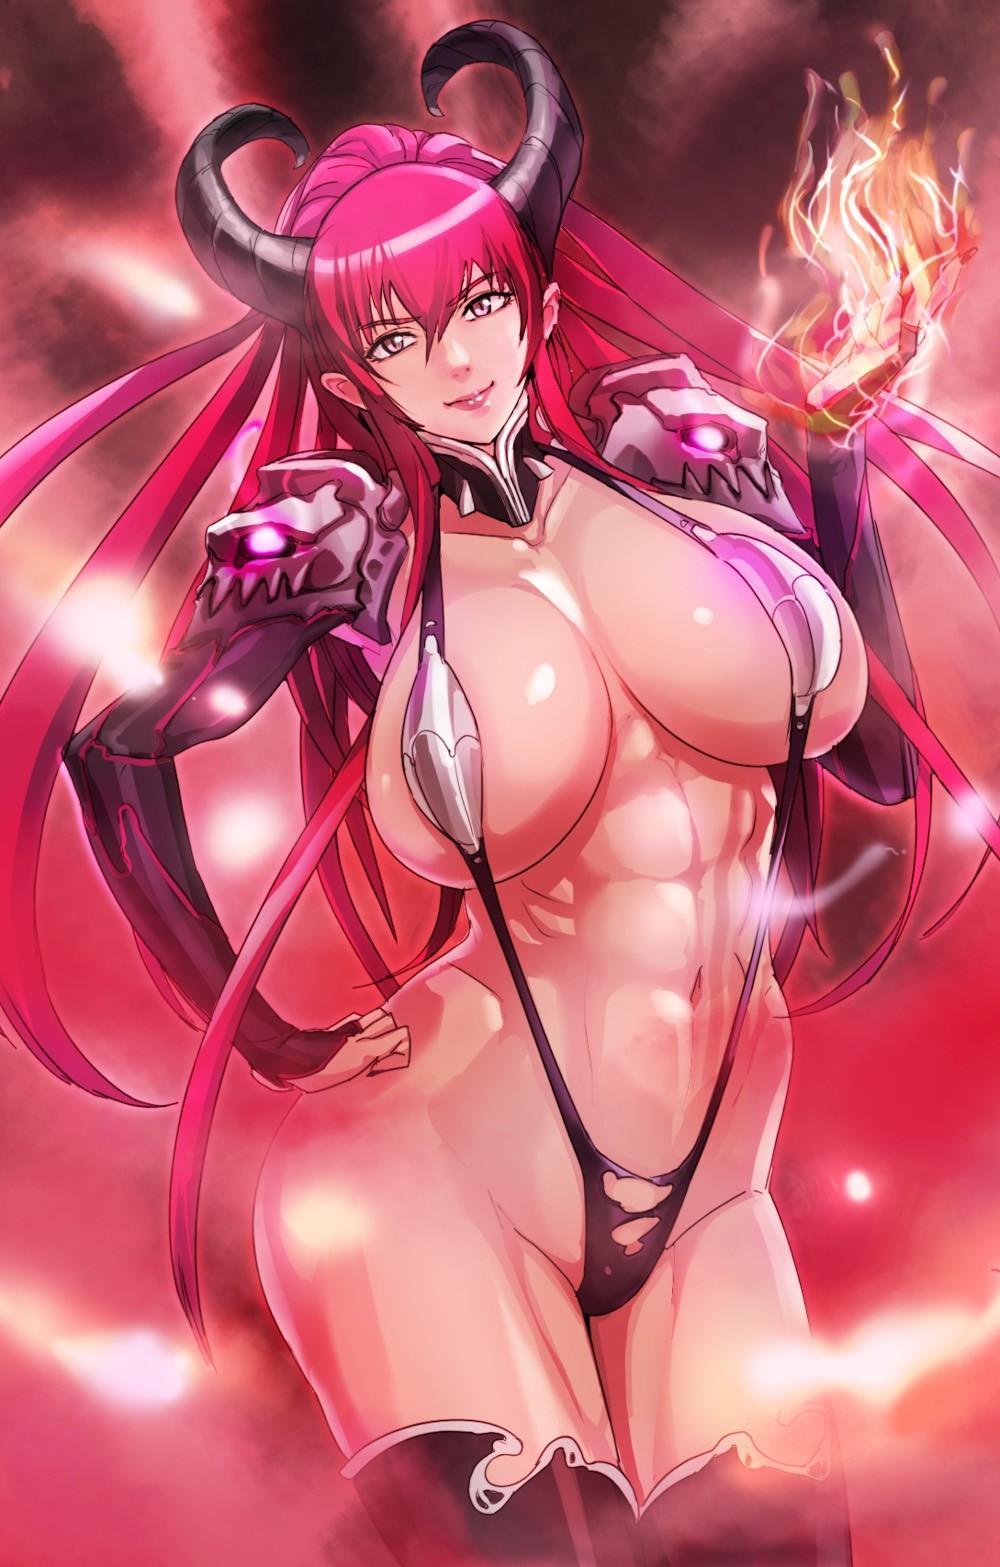 Demon girl hentai